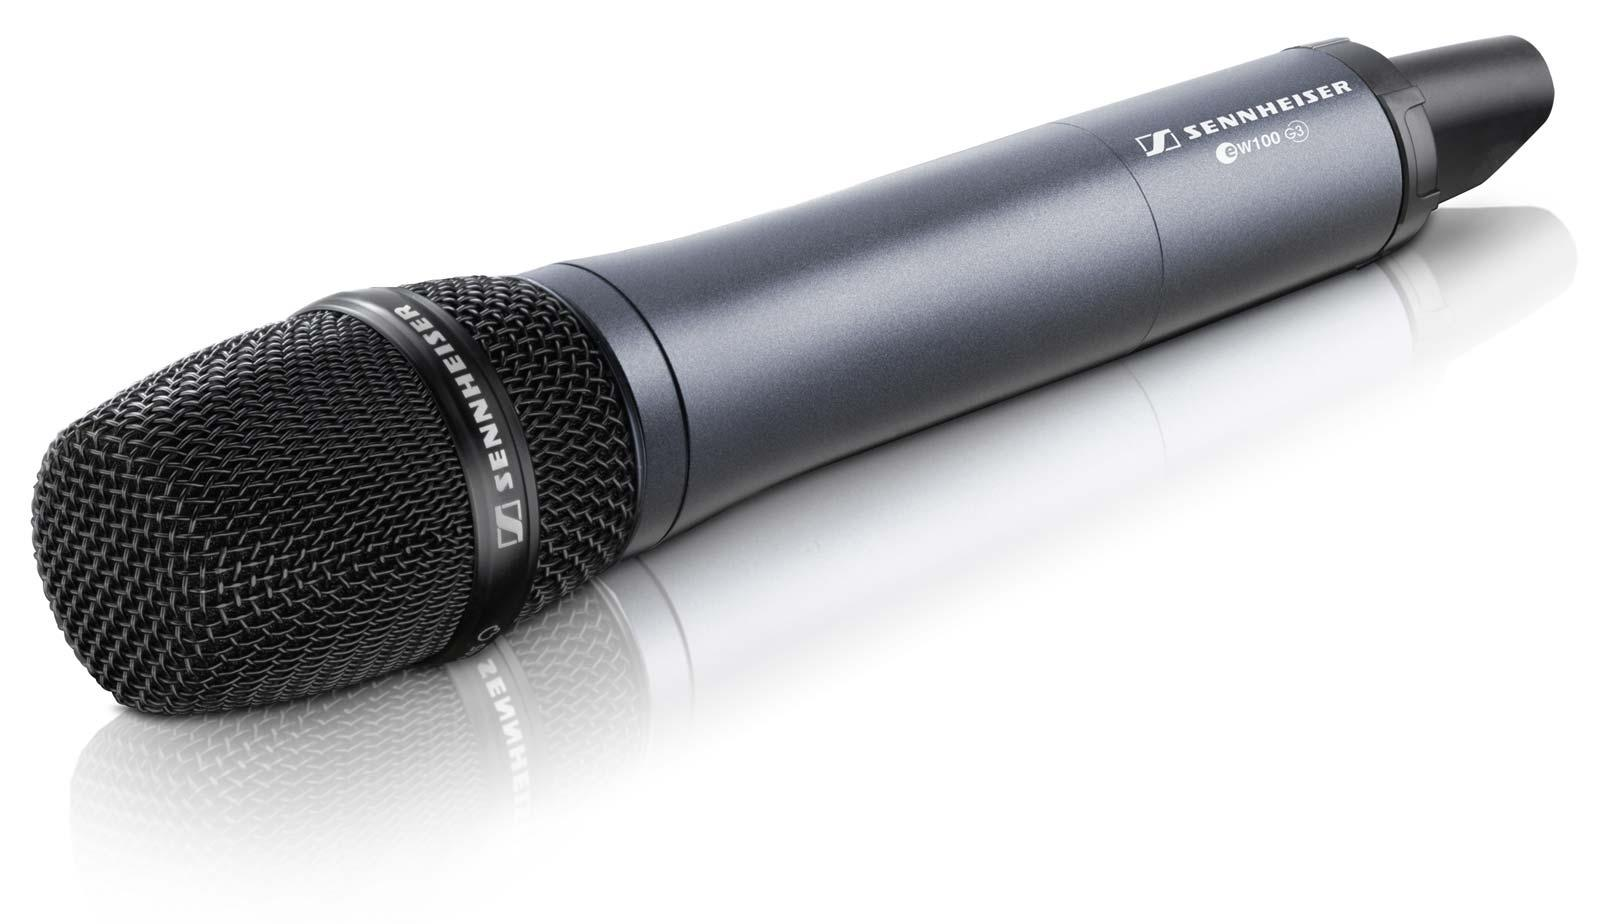 Sennheiser Ew 135 G3 B Handheld Wireless Microphone